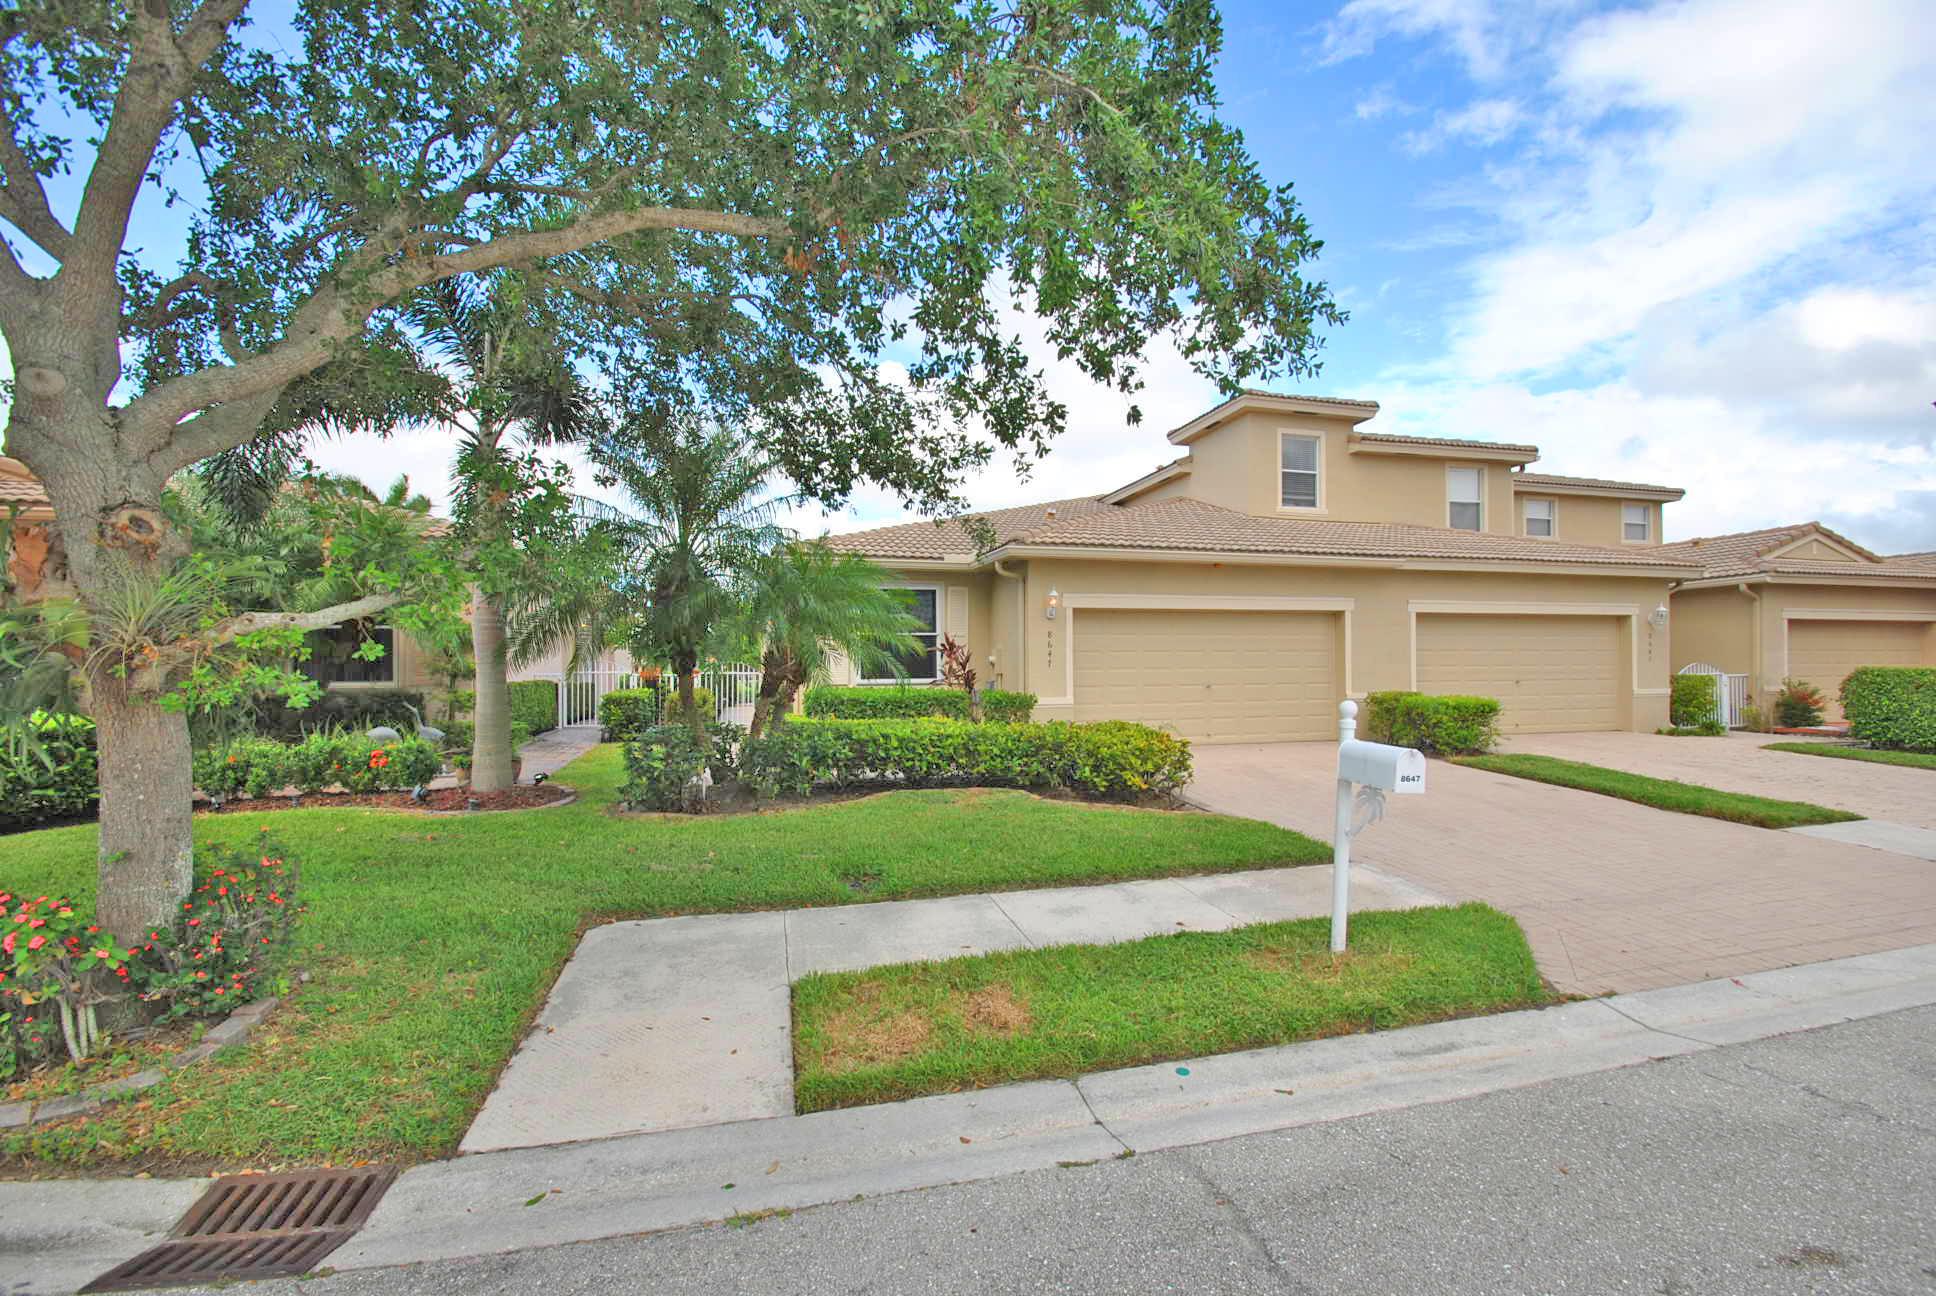 8647 Mangrove Cay For Rent - West Palm Beach, FL | Trulia